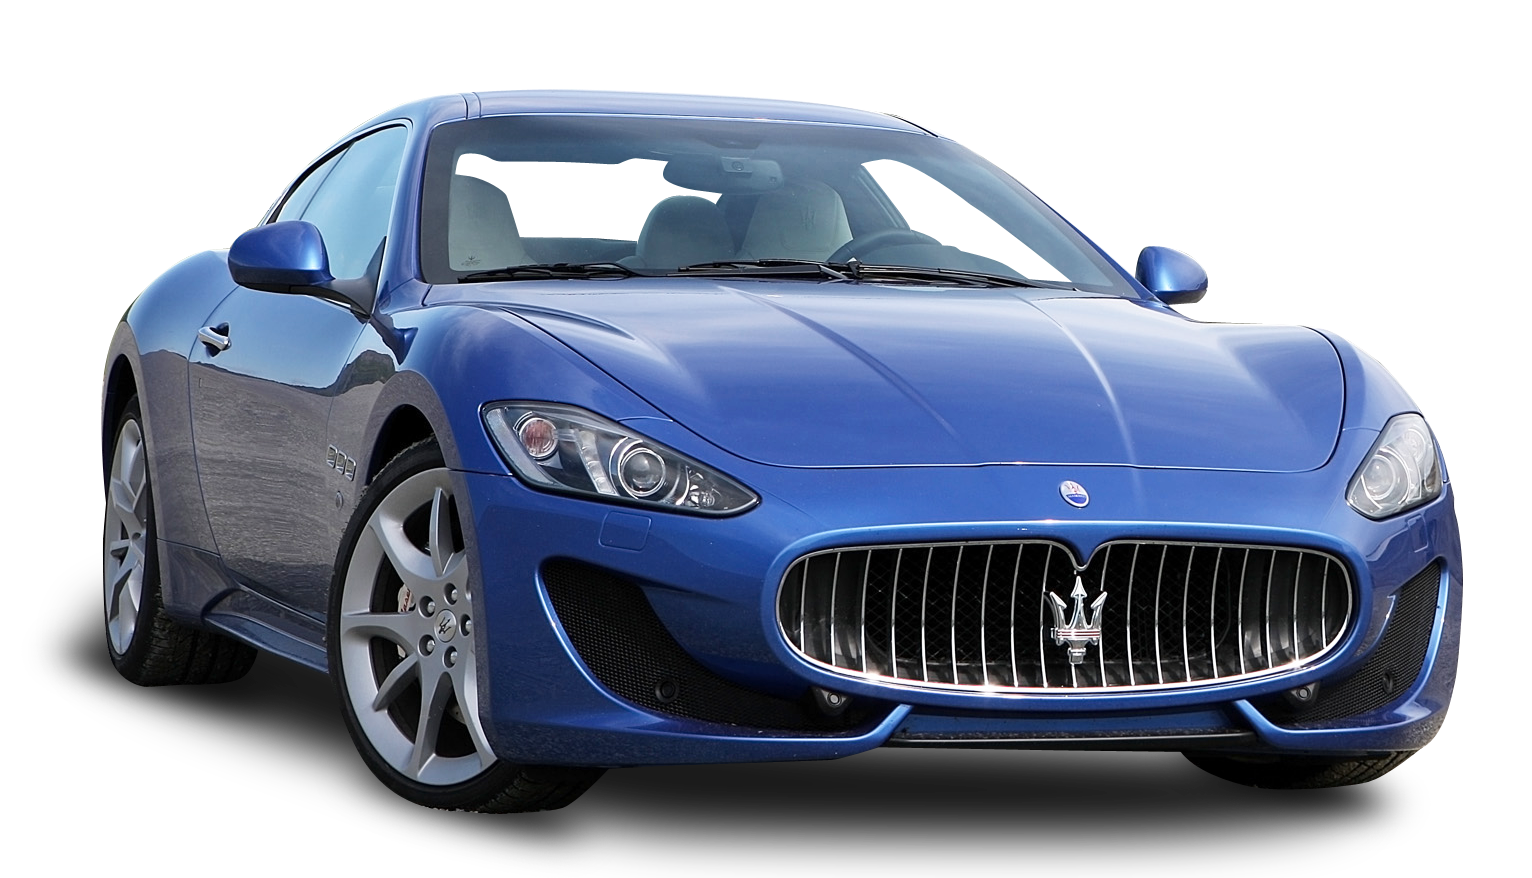 Blue Maserati GranTurismo Sport Duo Car